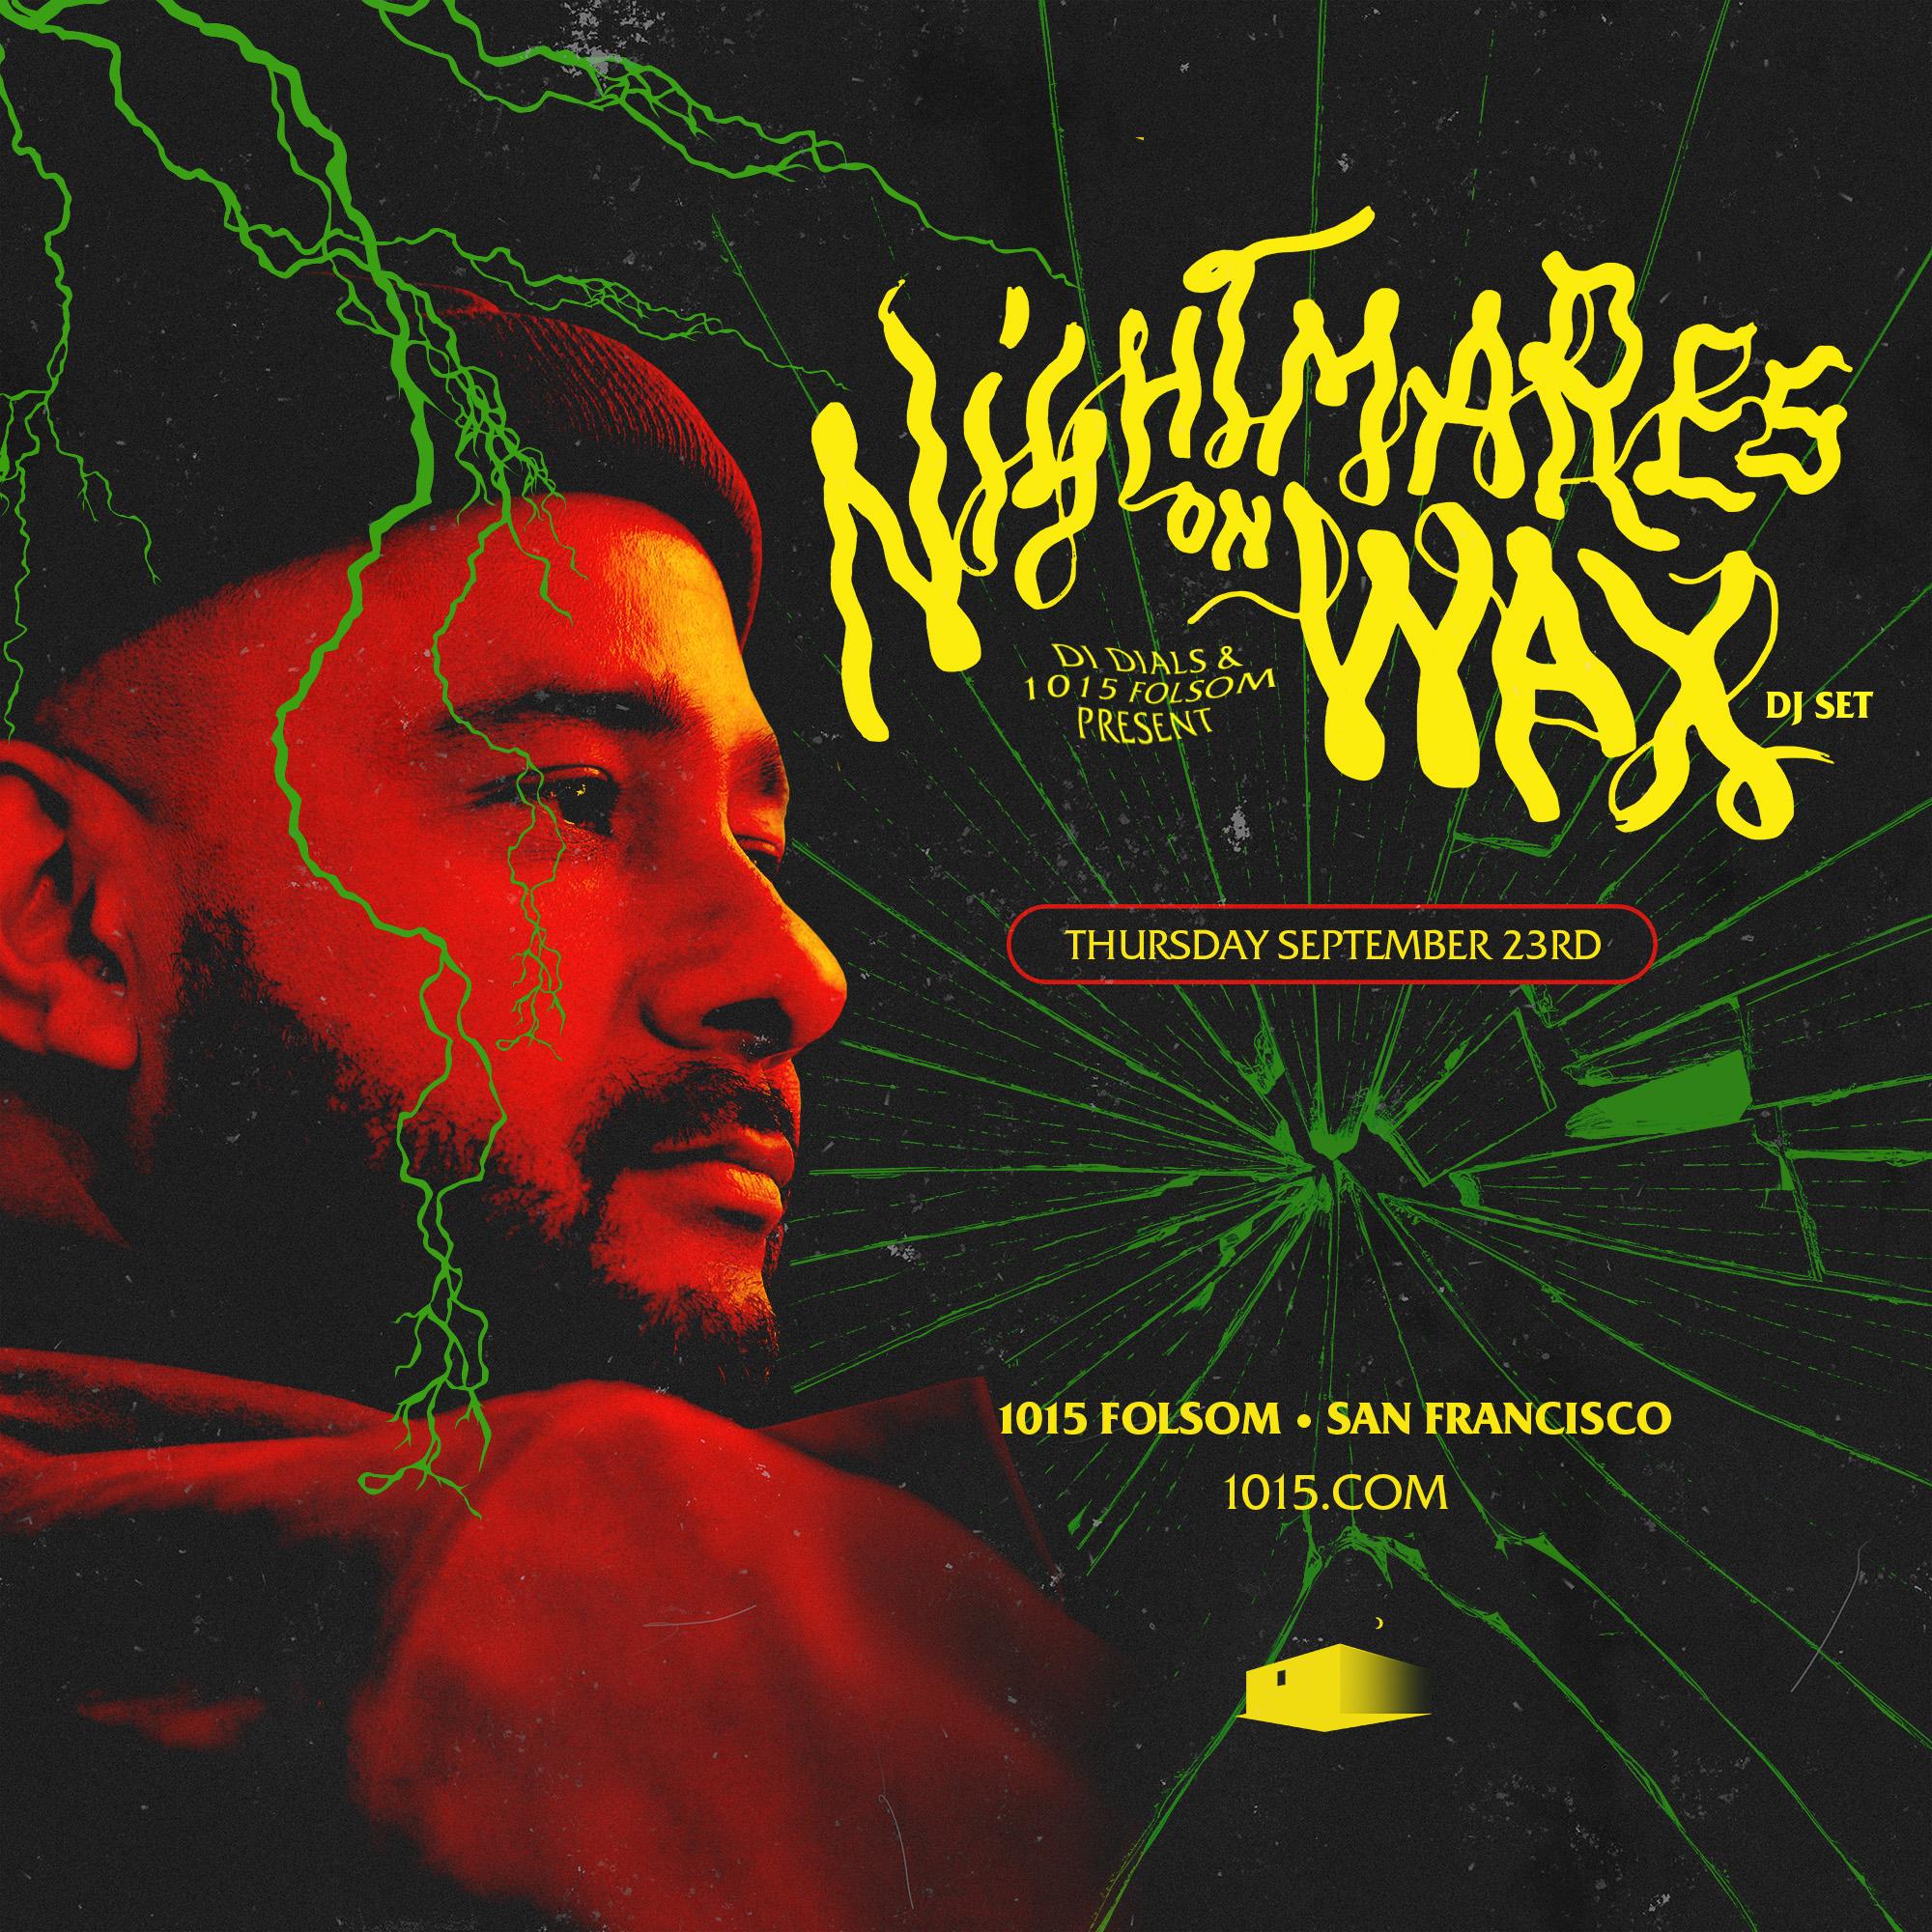 Nightmares on Wax: Main Image